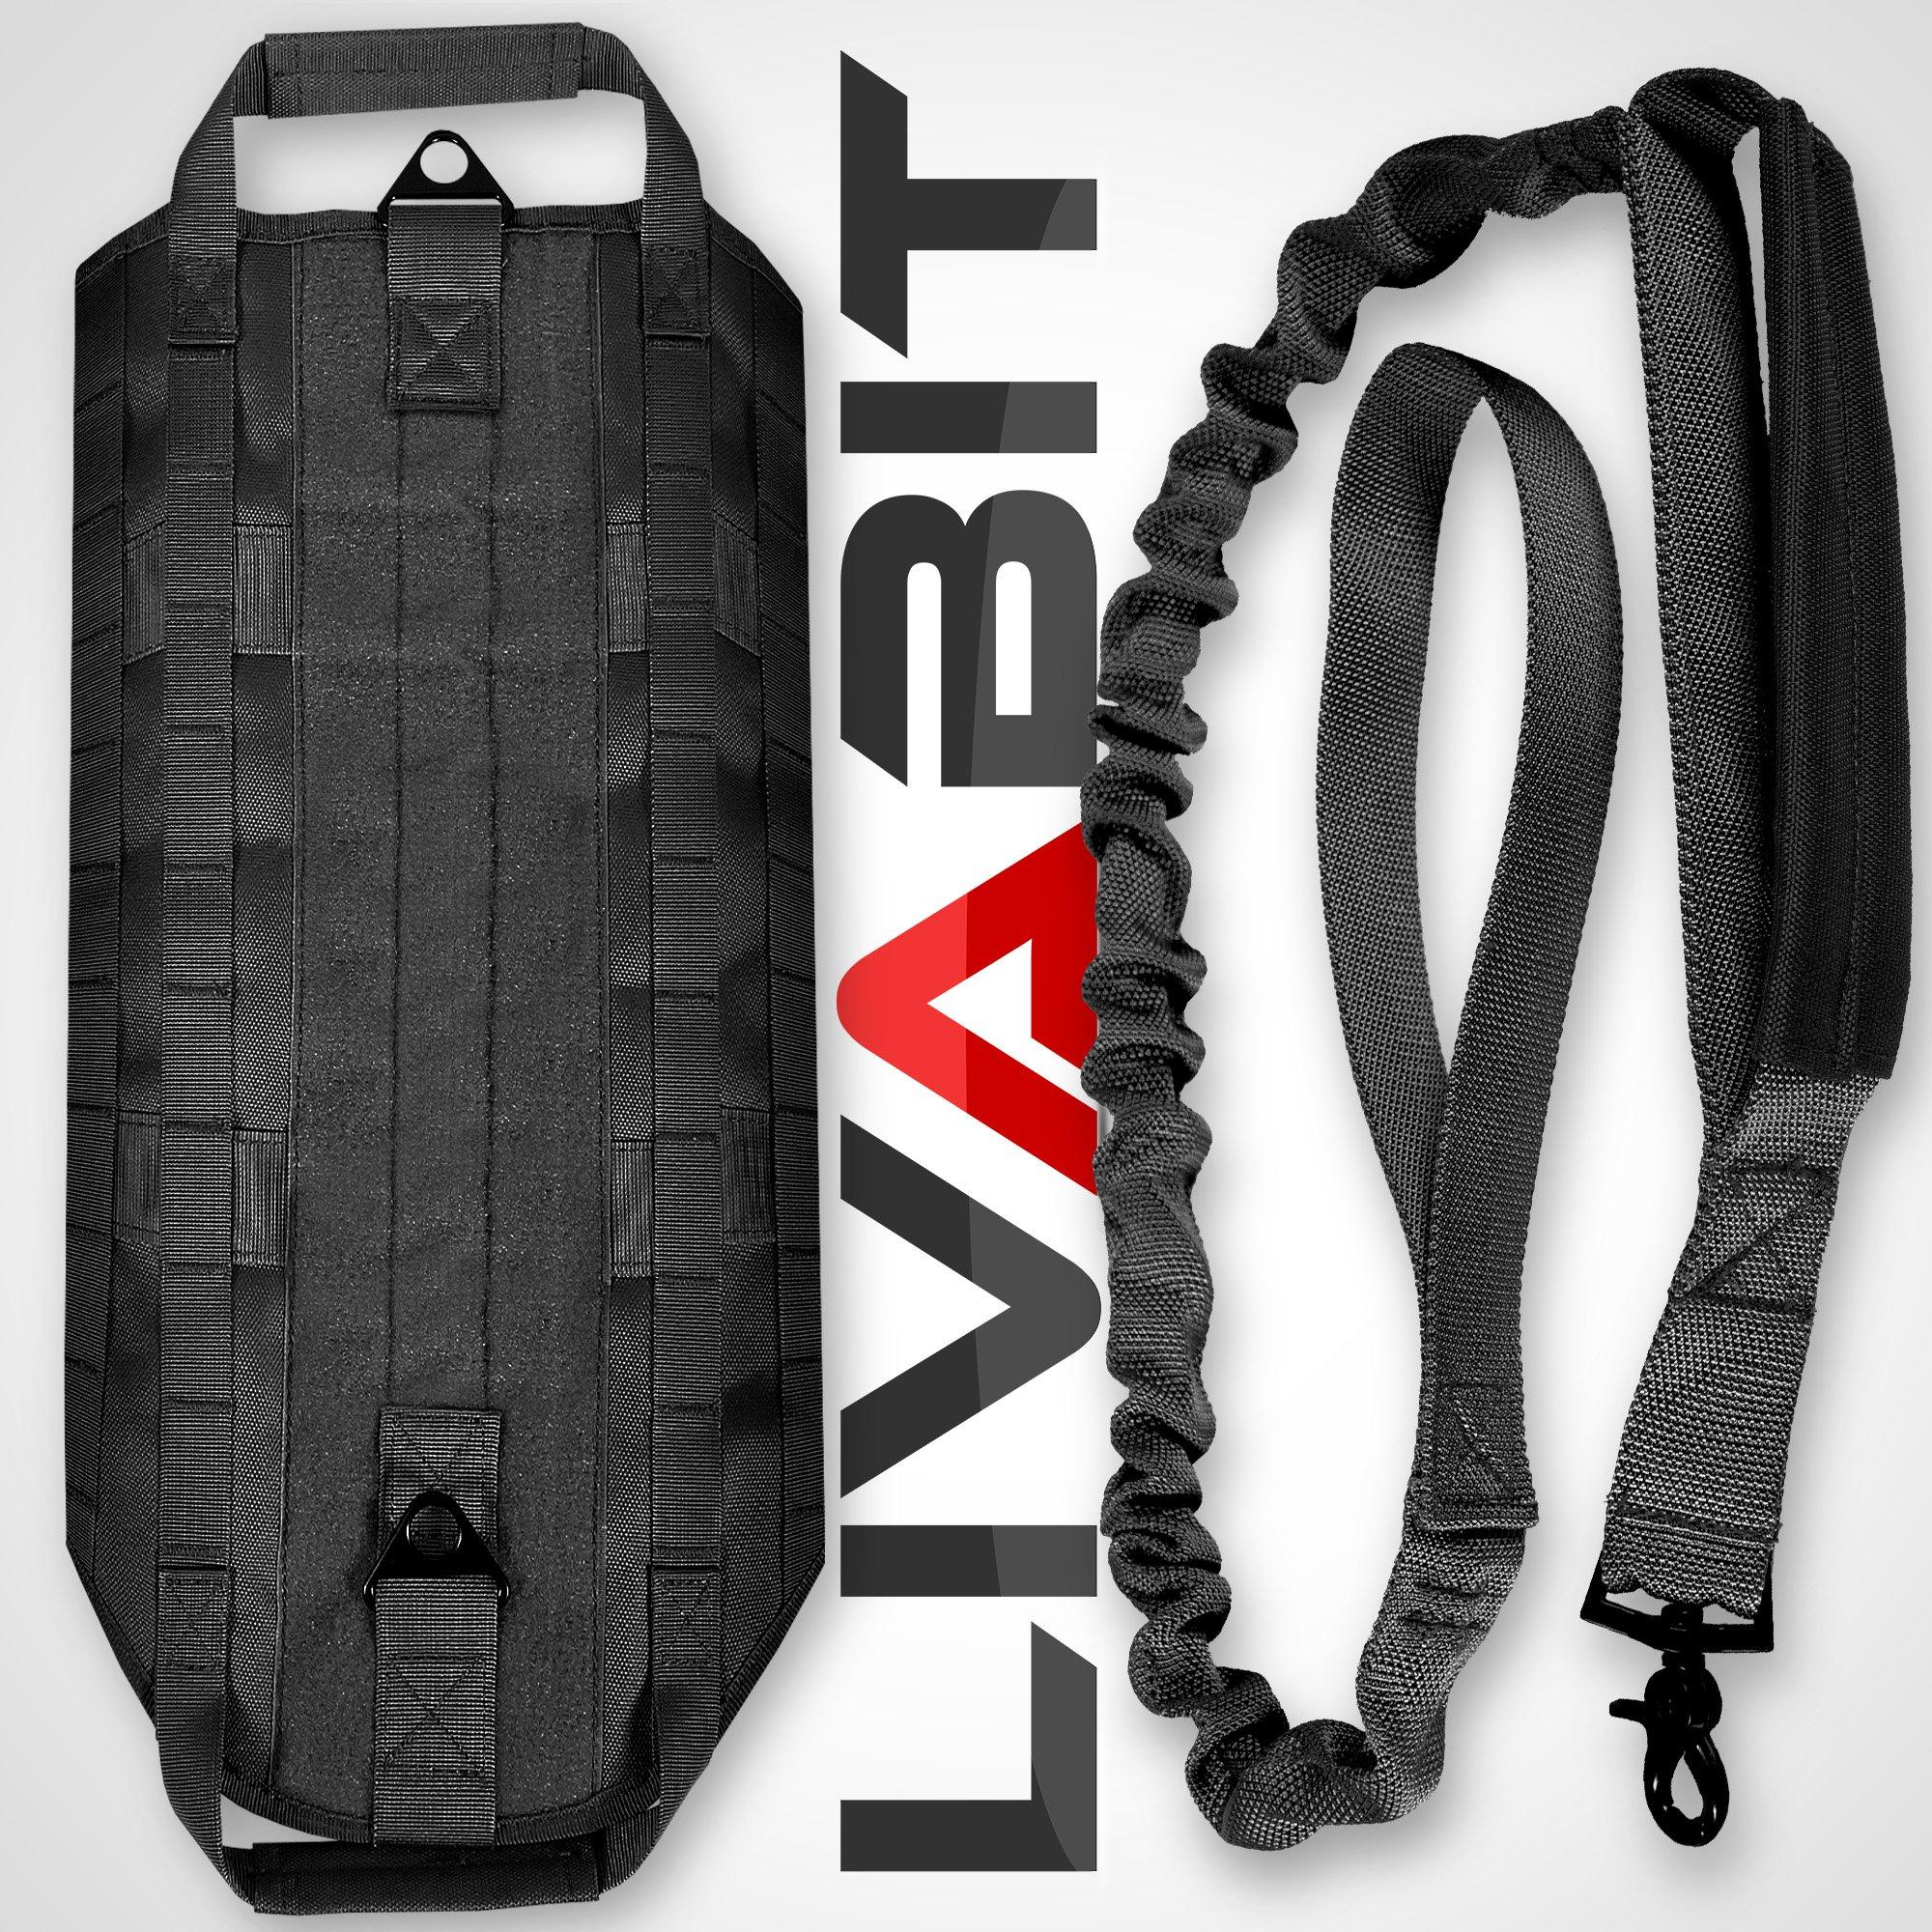 LIVABIT [ Black Canine Service Dog Tactical Molle Vest Harness + Morale PVC Patches + Matching Heavy Duty Bungee Leash Strap X-Large by LIVABIT